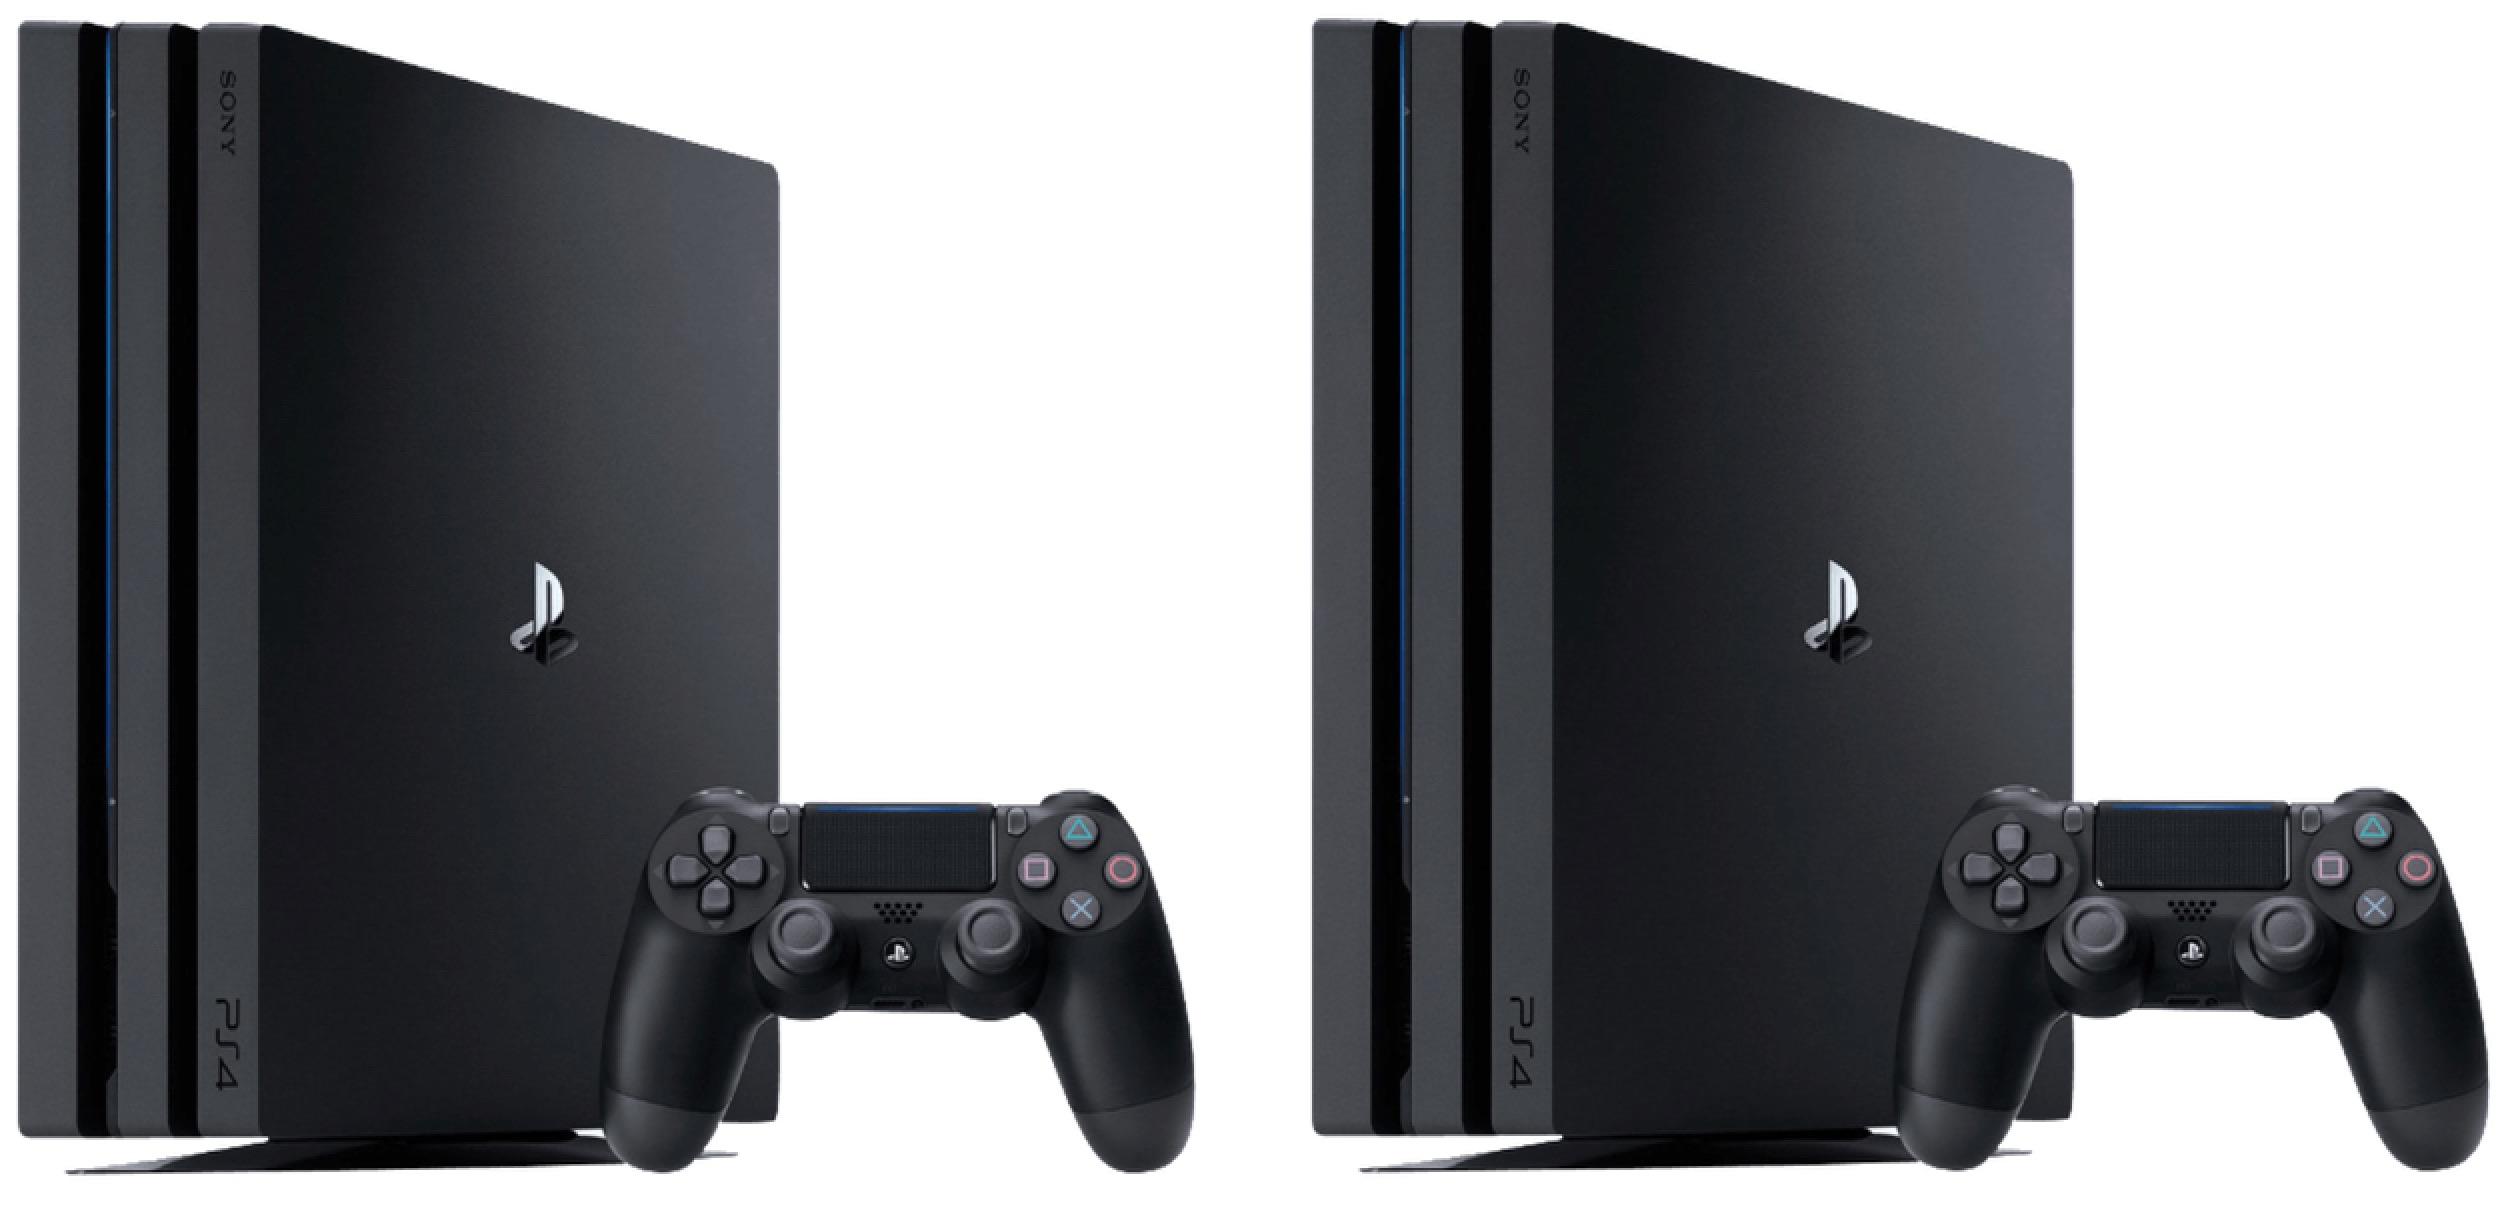 Top! Doppelpack SONY PlayStation 4 Pro 1TB für nur 598,- Euro